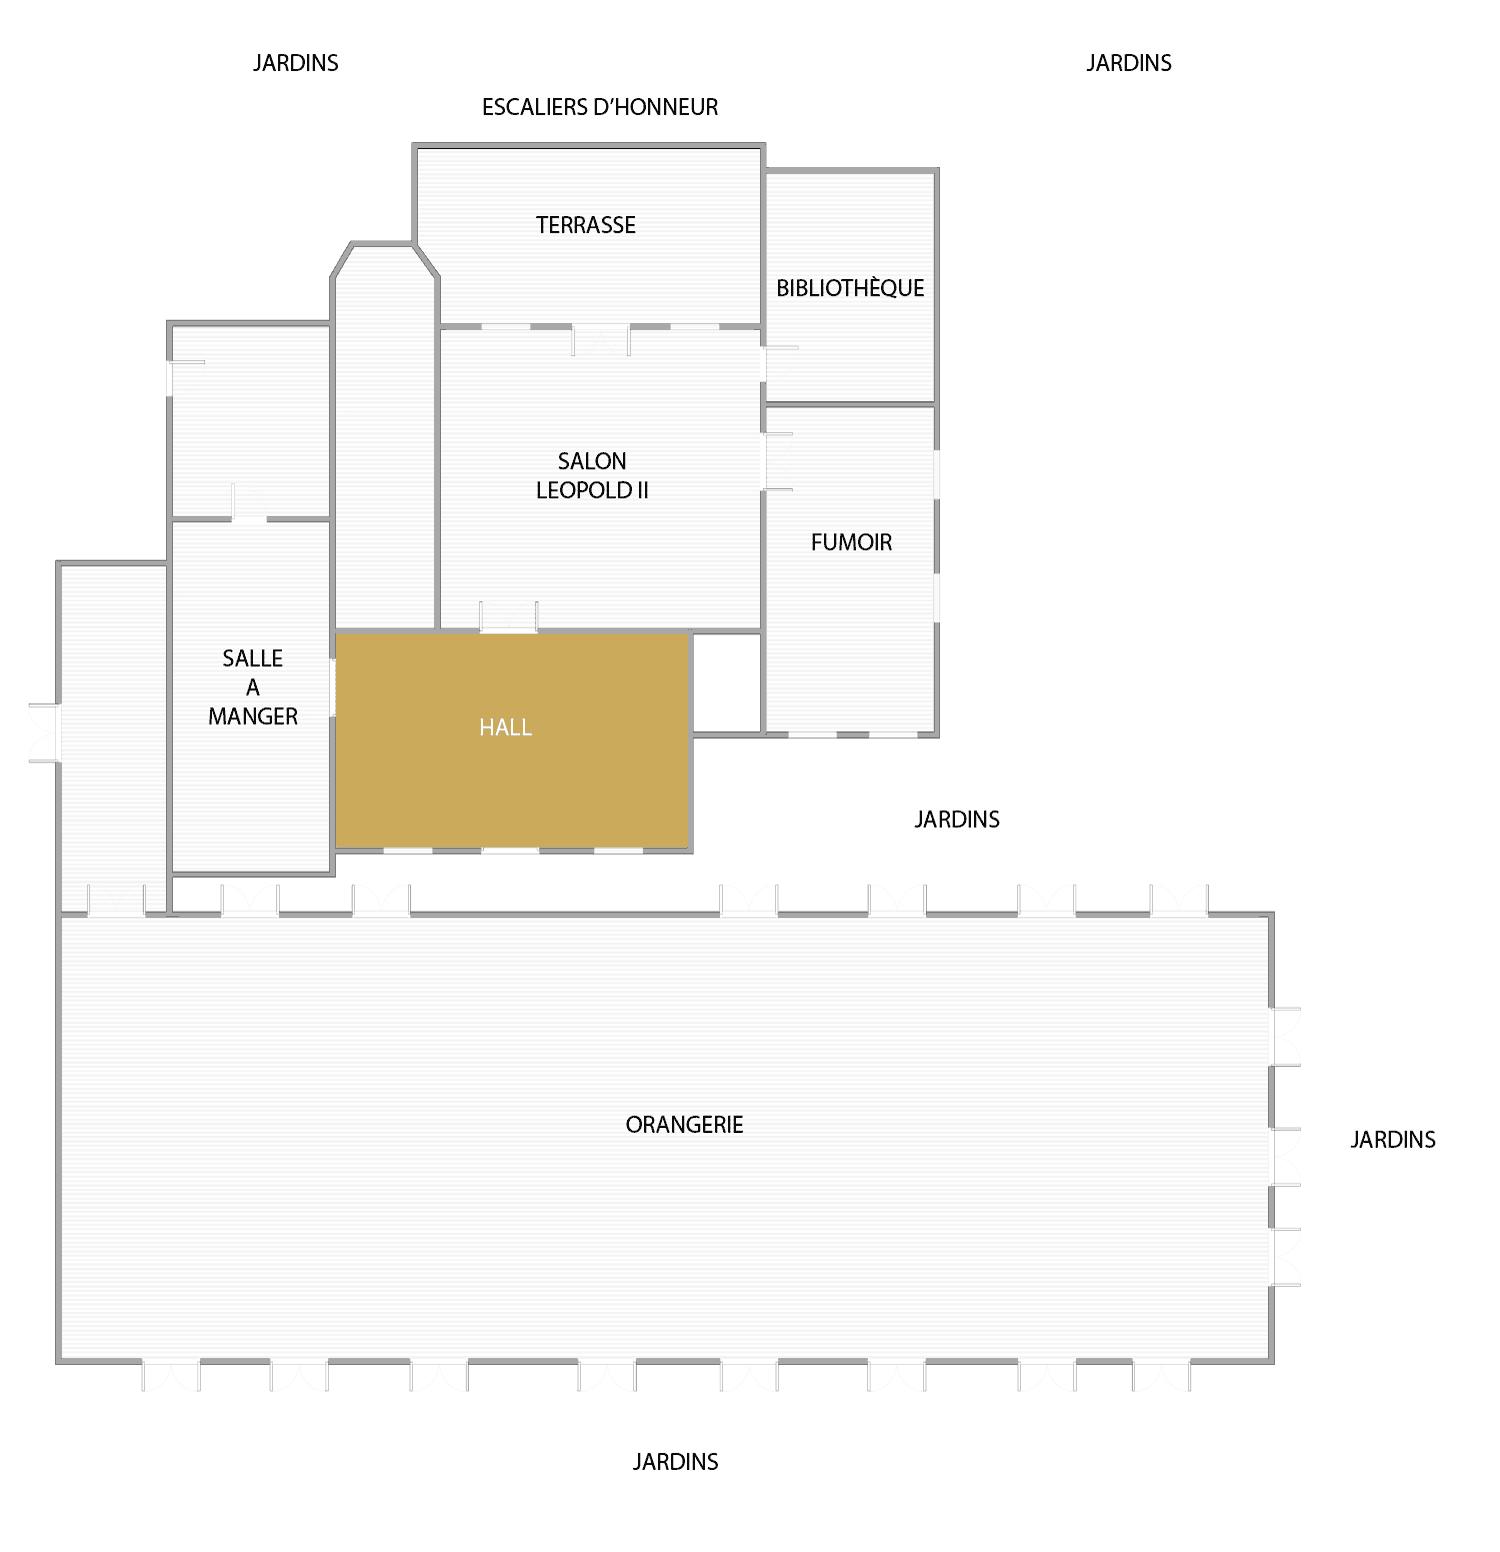 Terblock hall